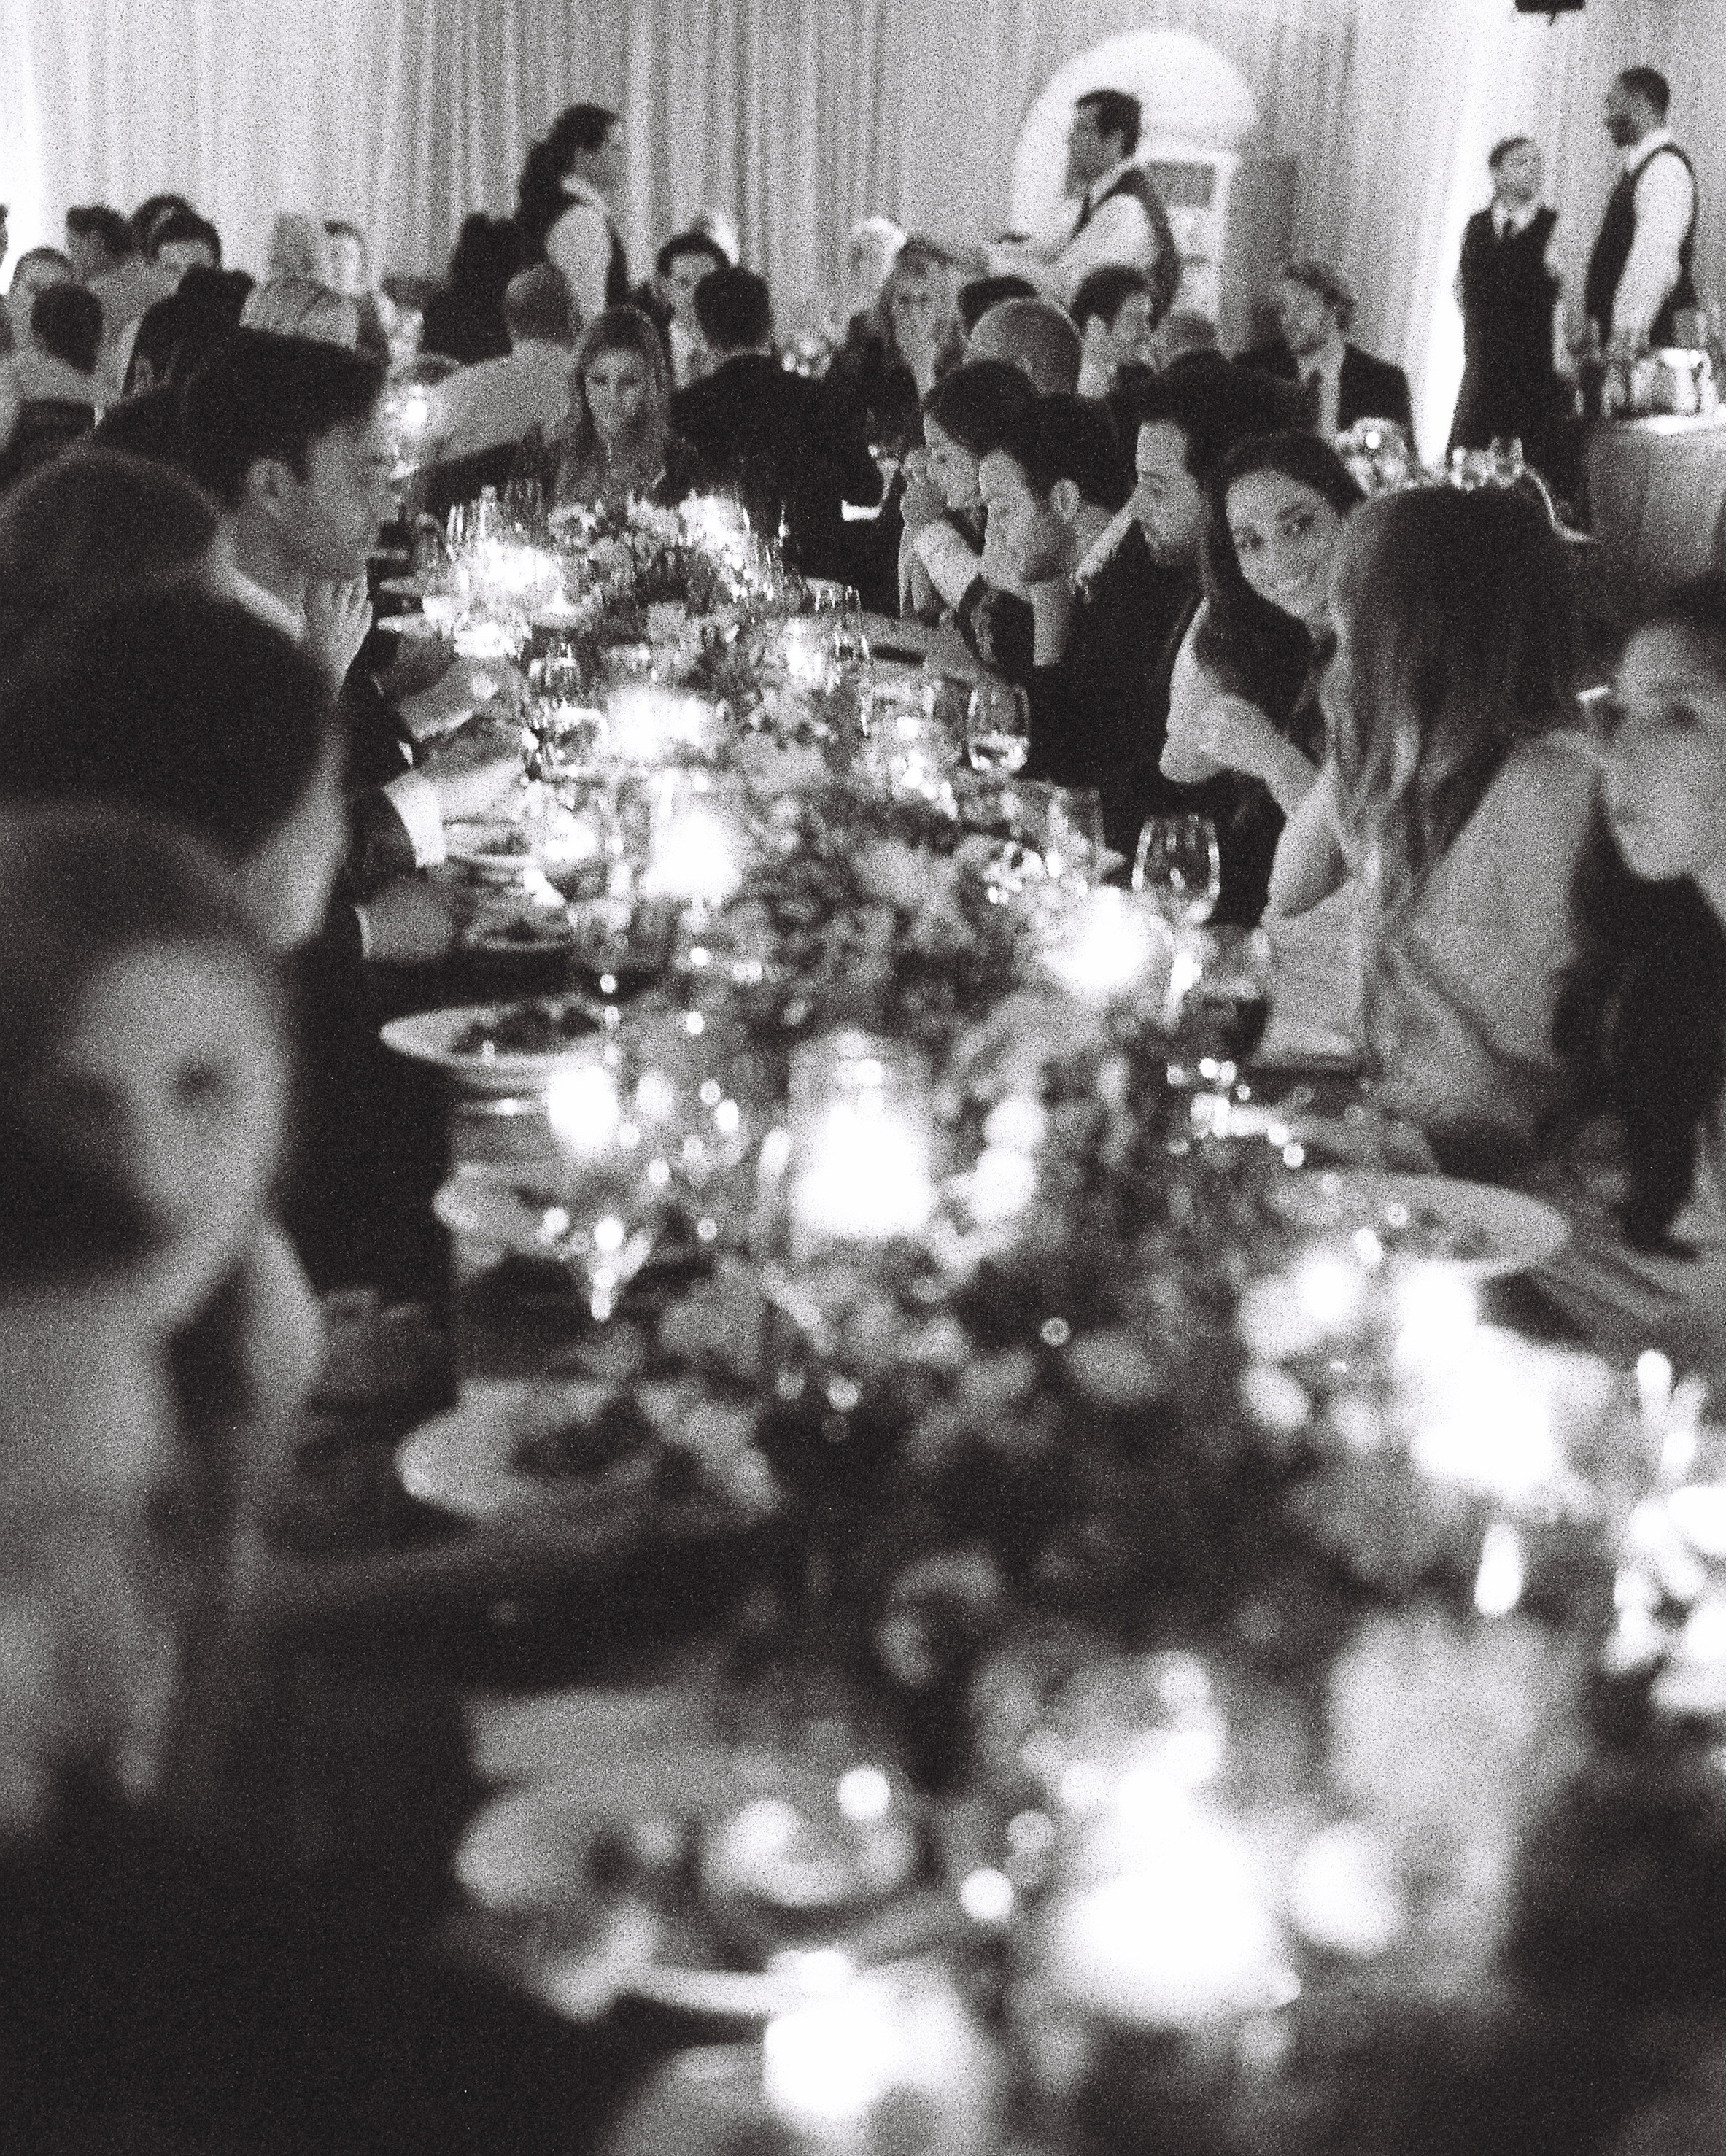 jackie-ross-wedding-reception-127-s111775-0215.jpg